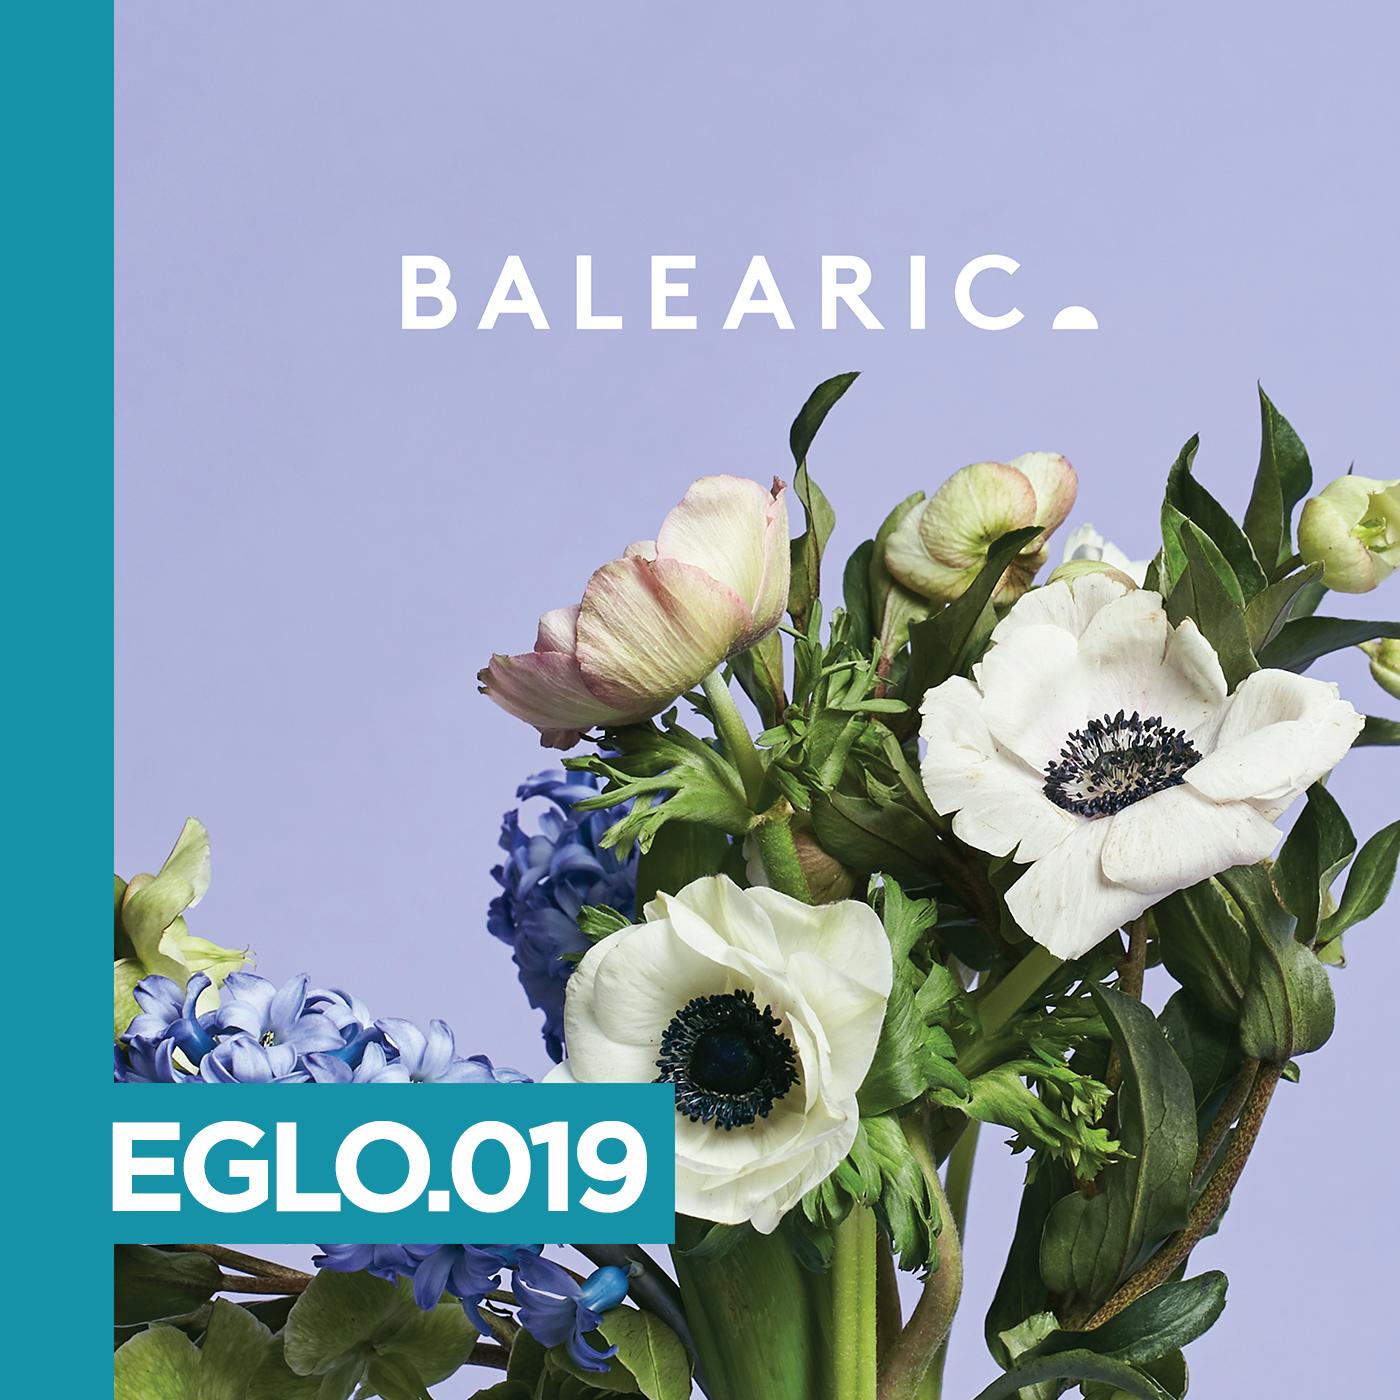 EGLO.019 Balearic Sound System / Quinn Lamont Luke